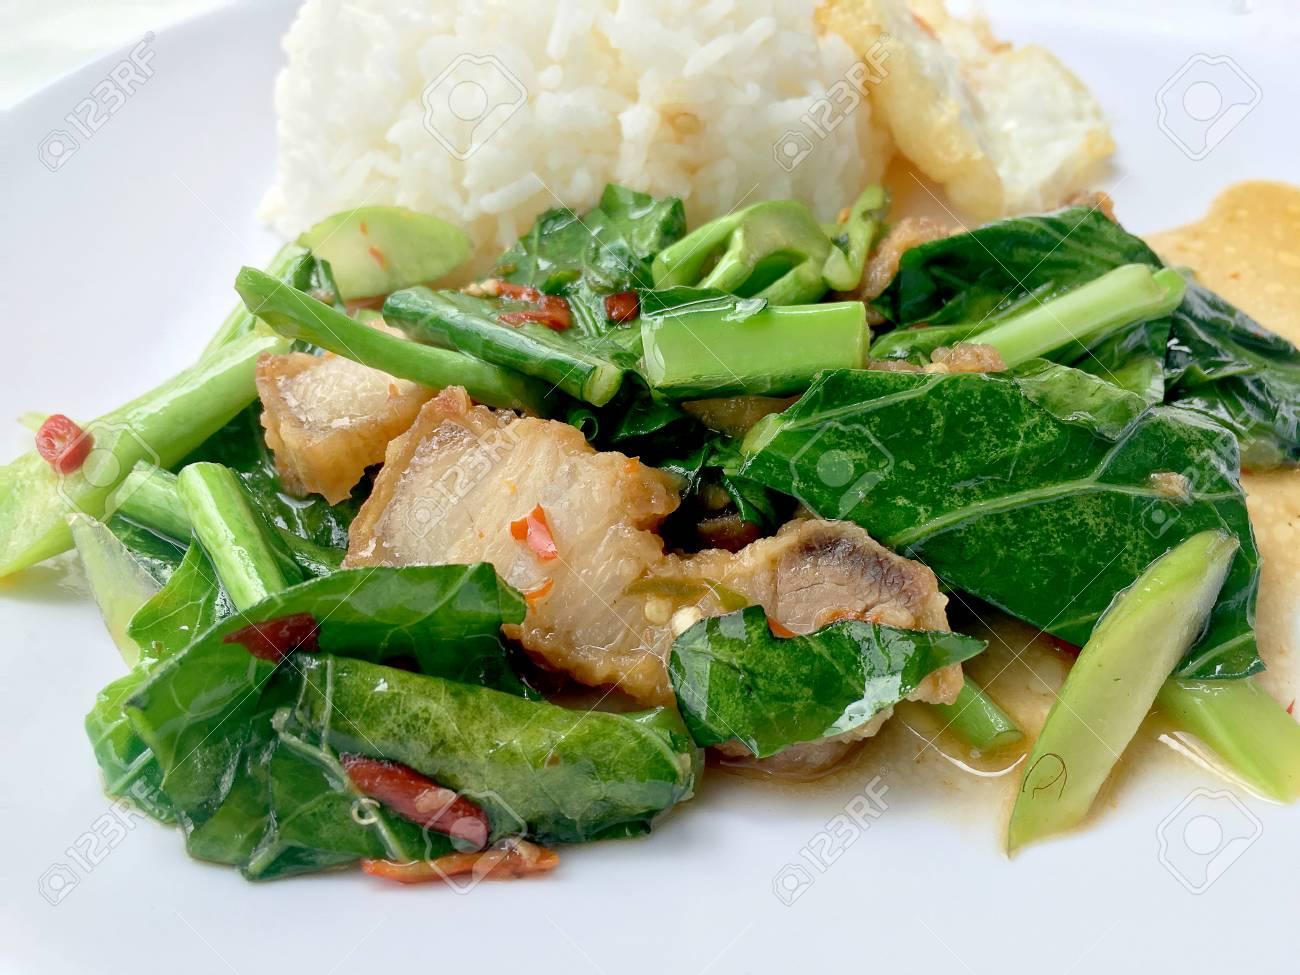 Stir fry Kai Land and crispy pork, stir fried rice with rice